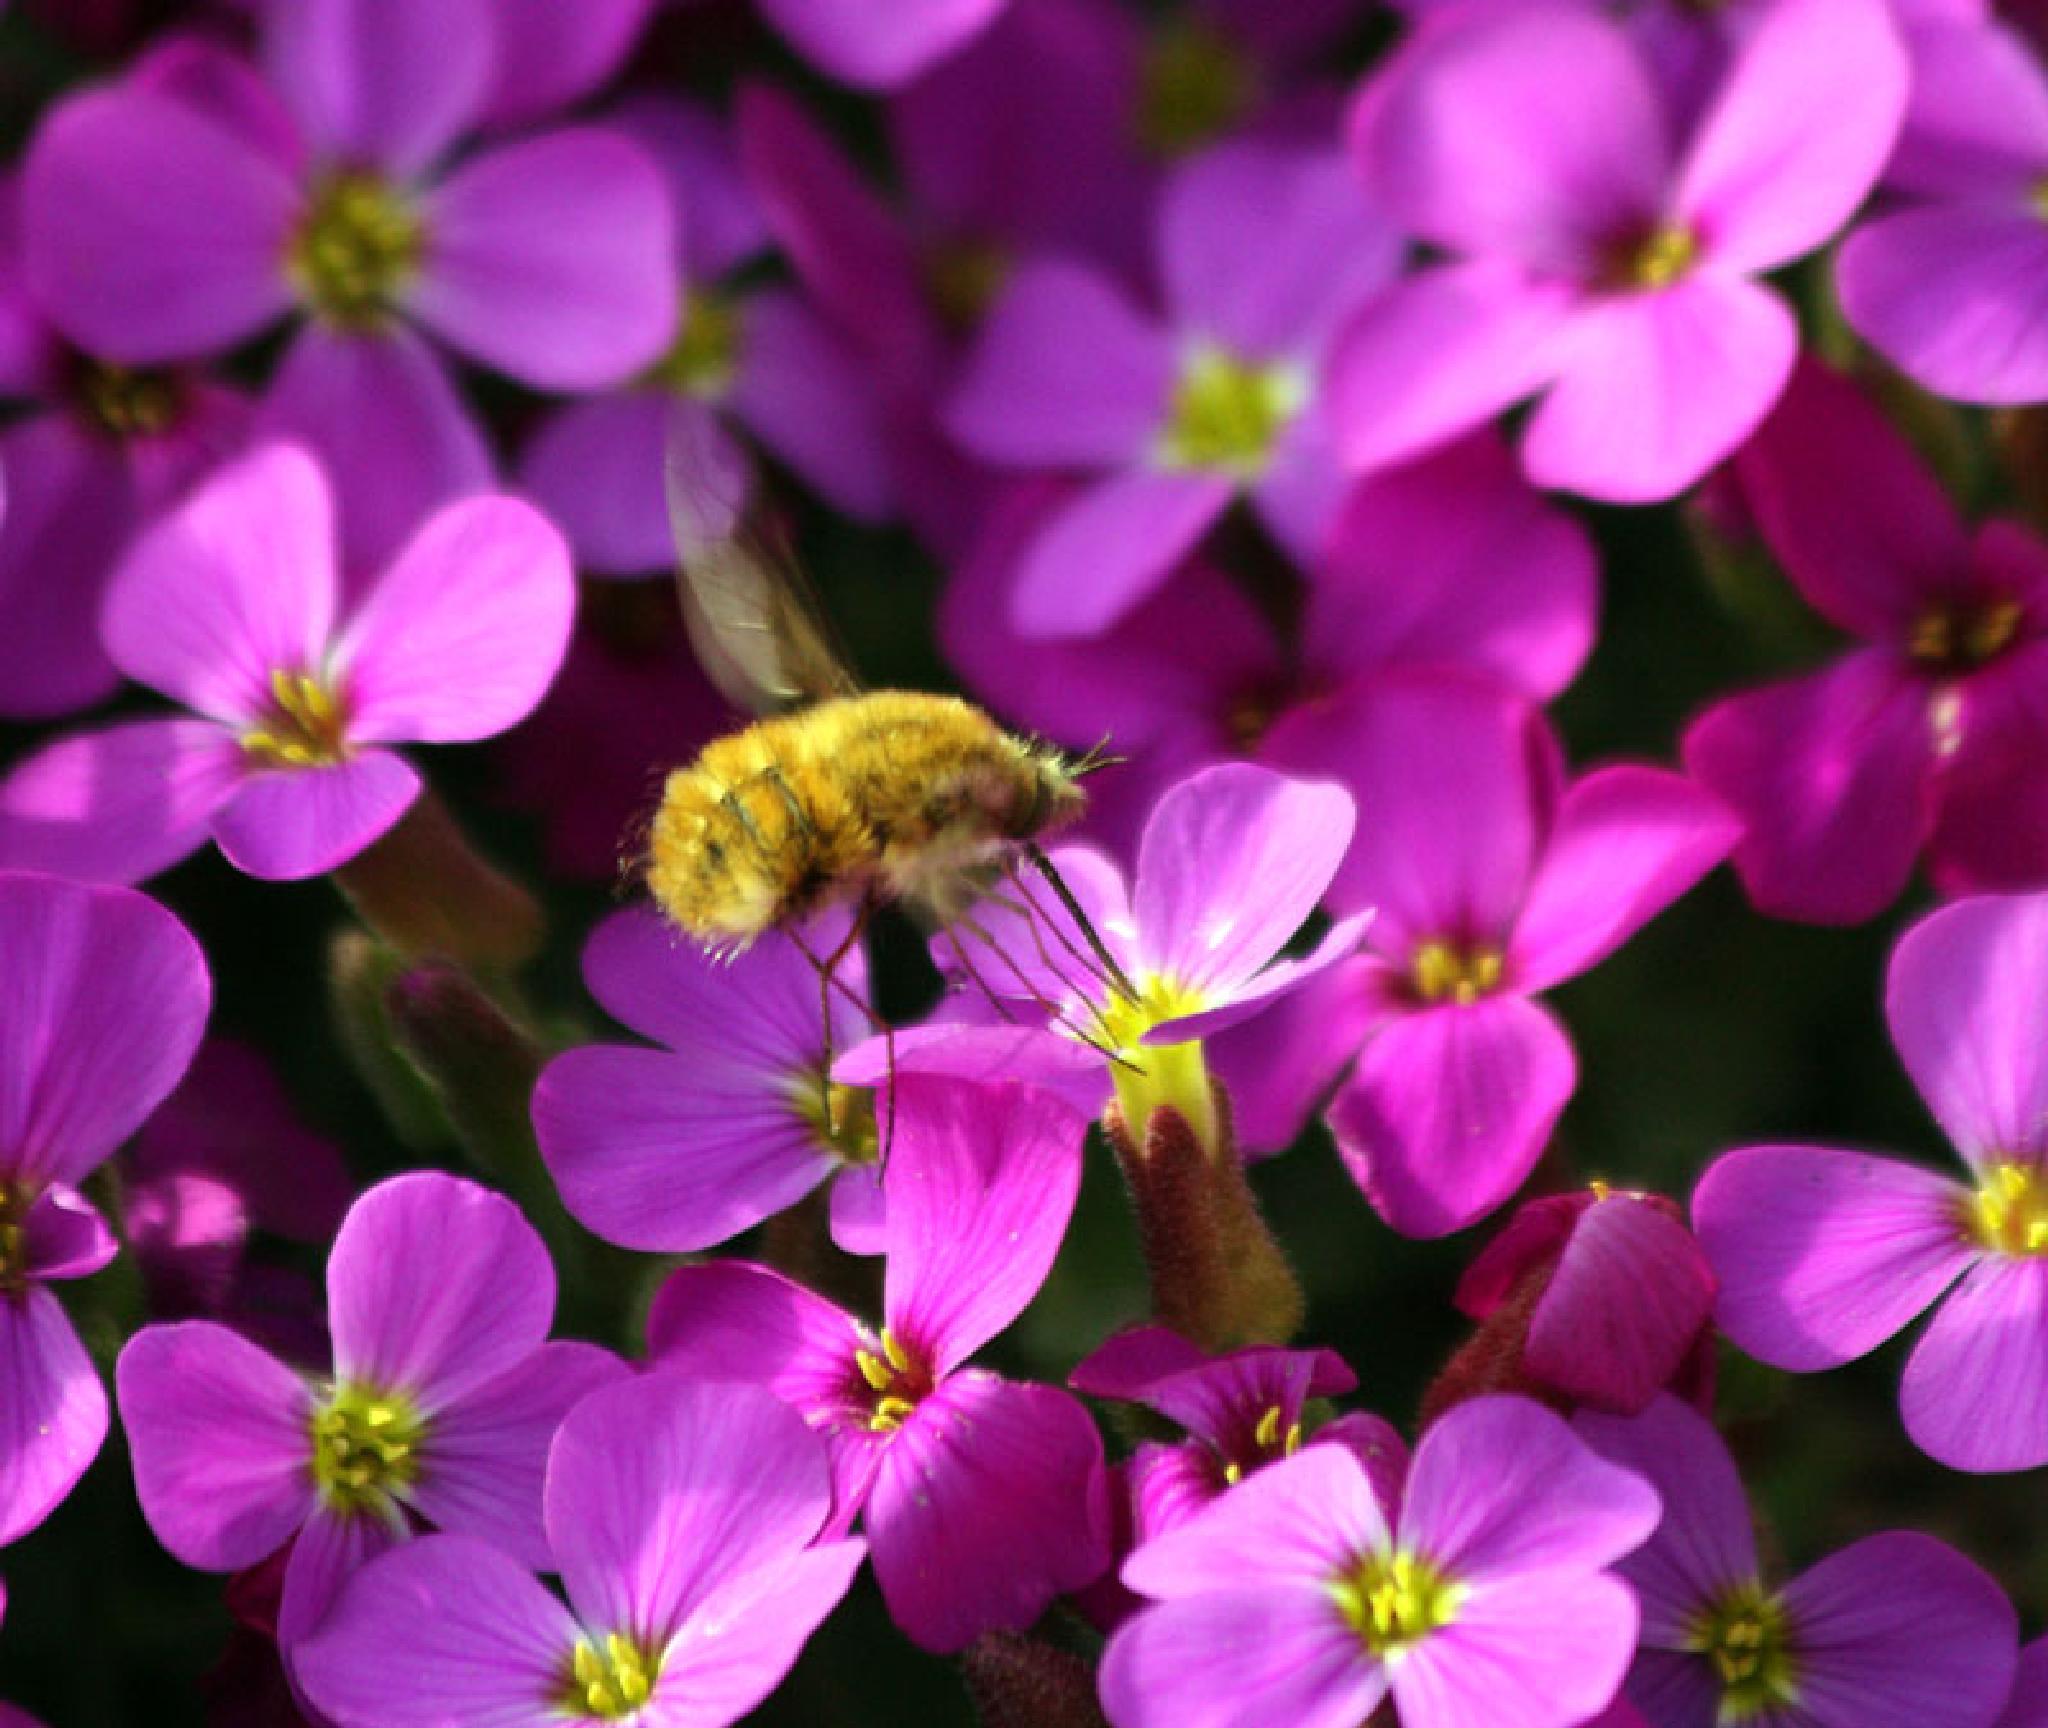 Bee Godsted by vedvejen